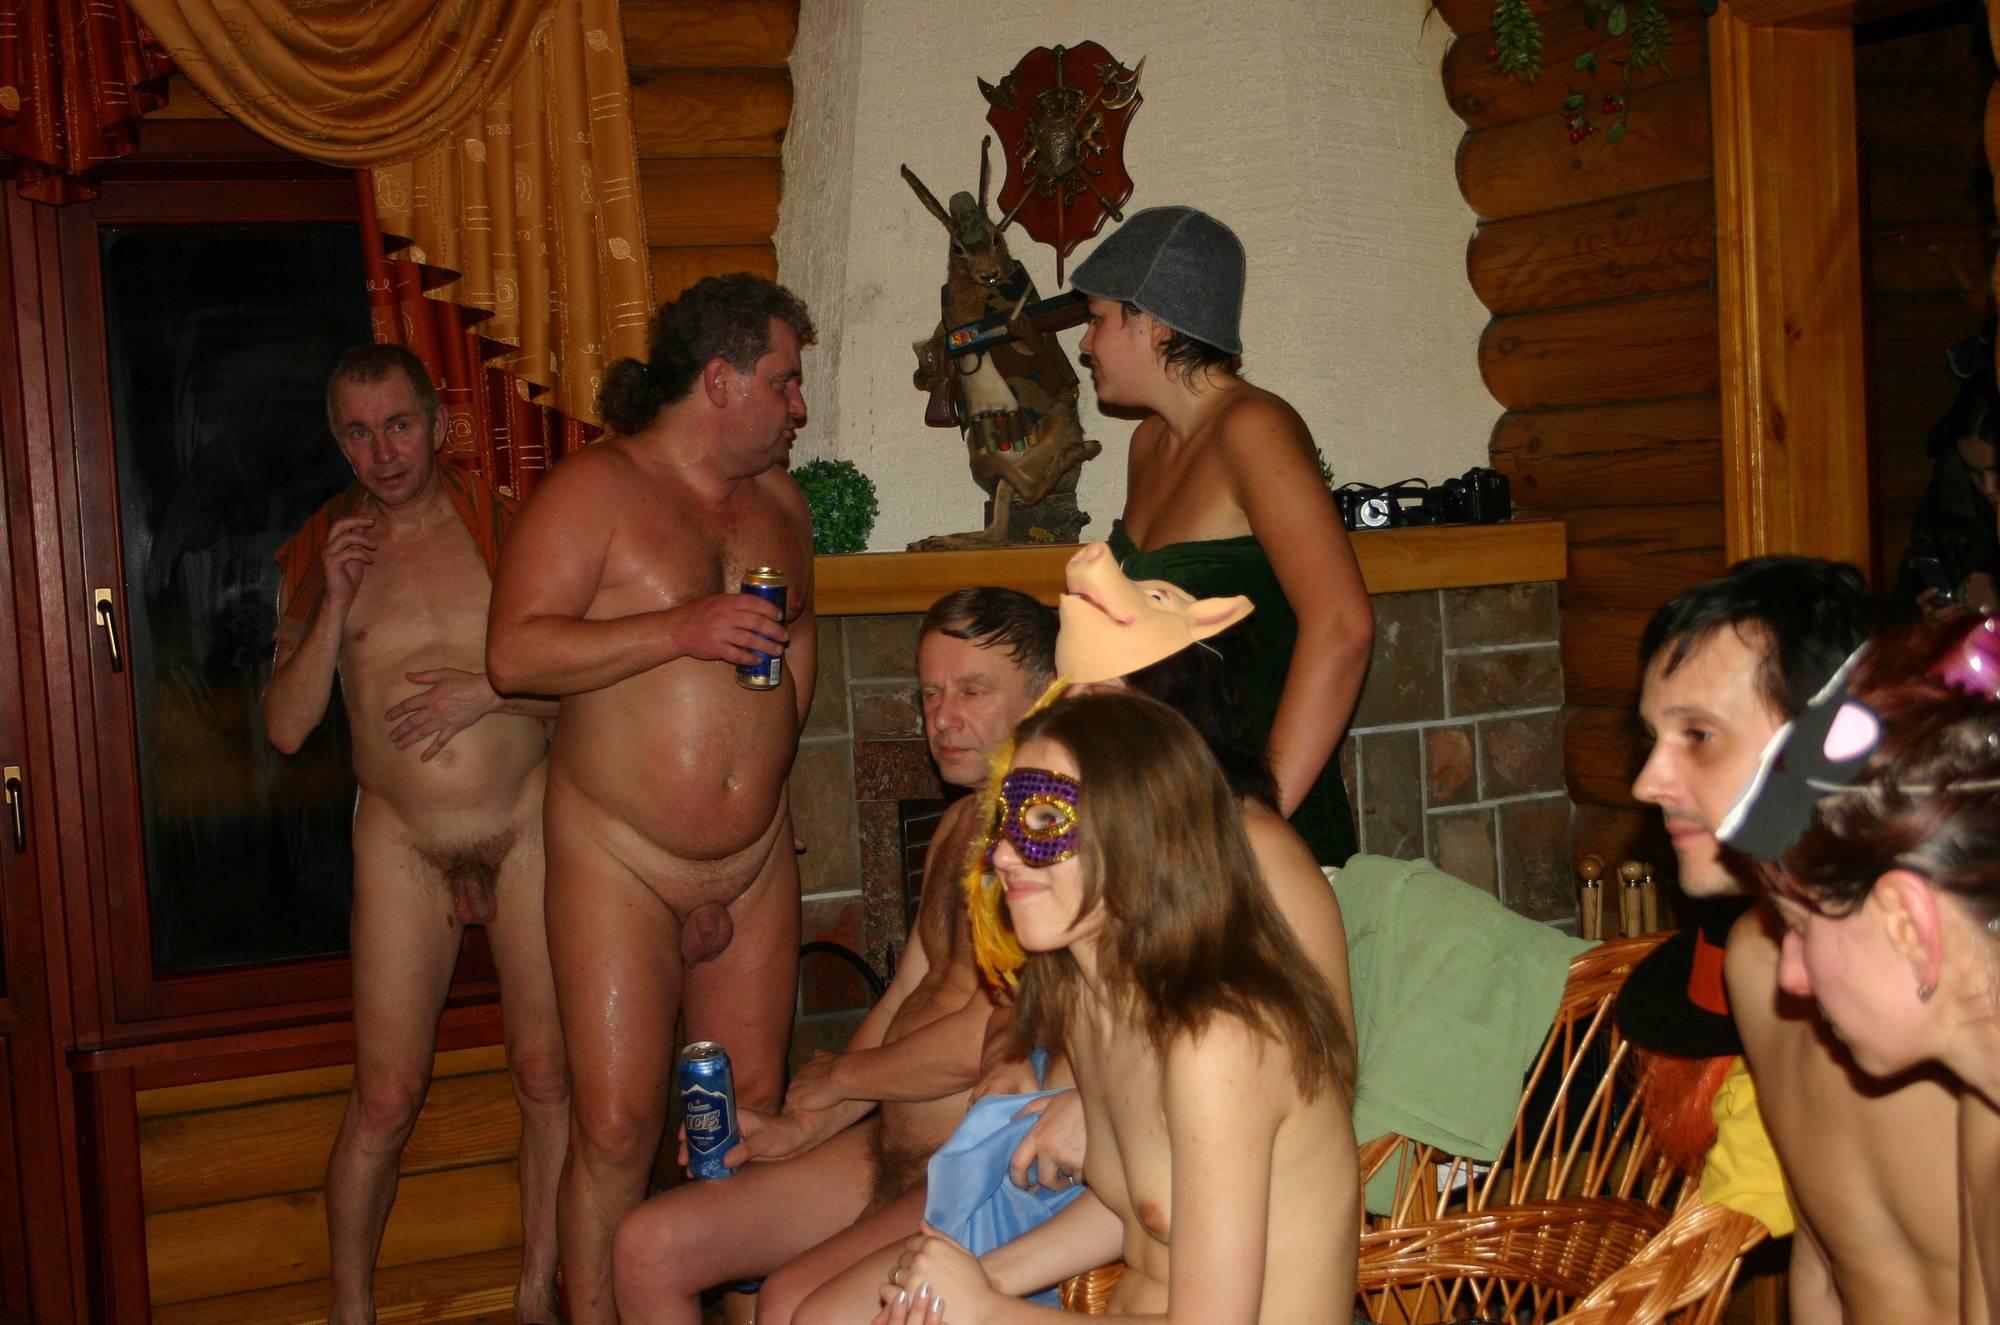 Kiev Masquerade Huddle - 1